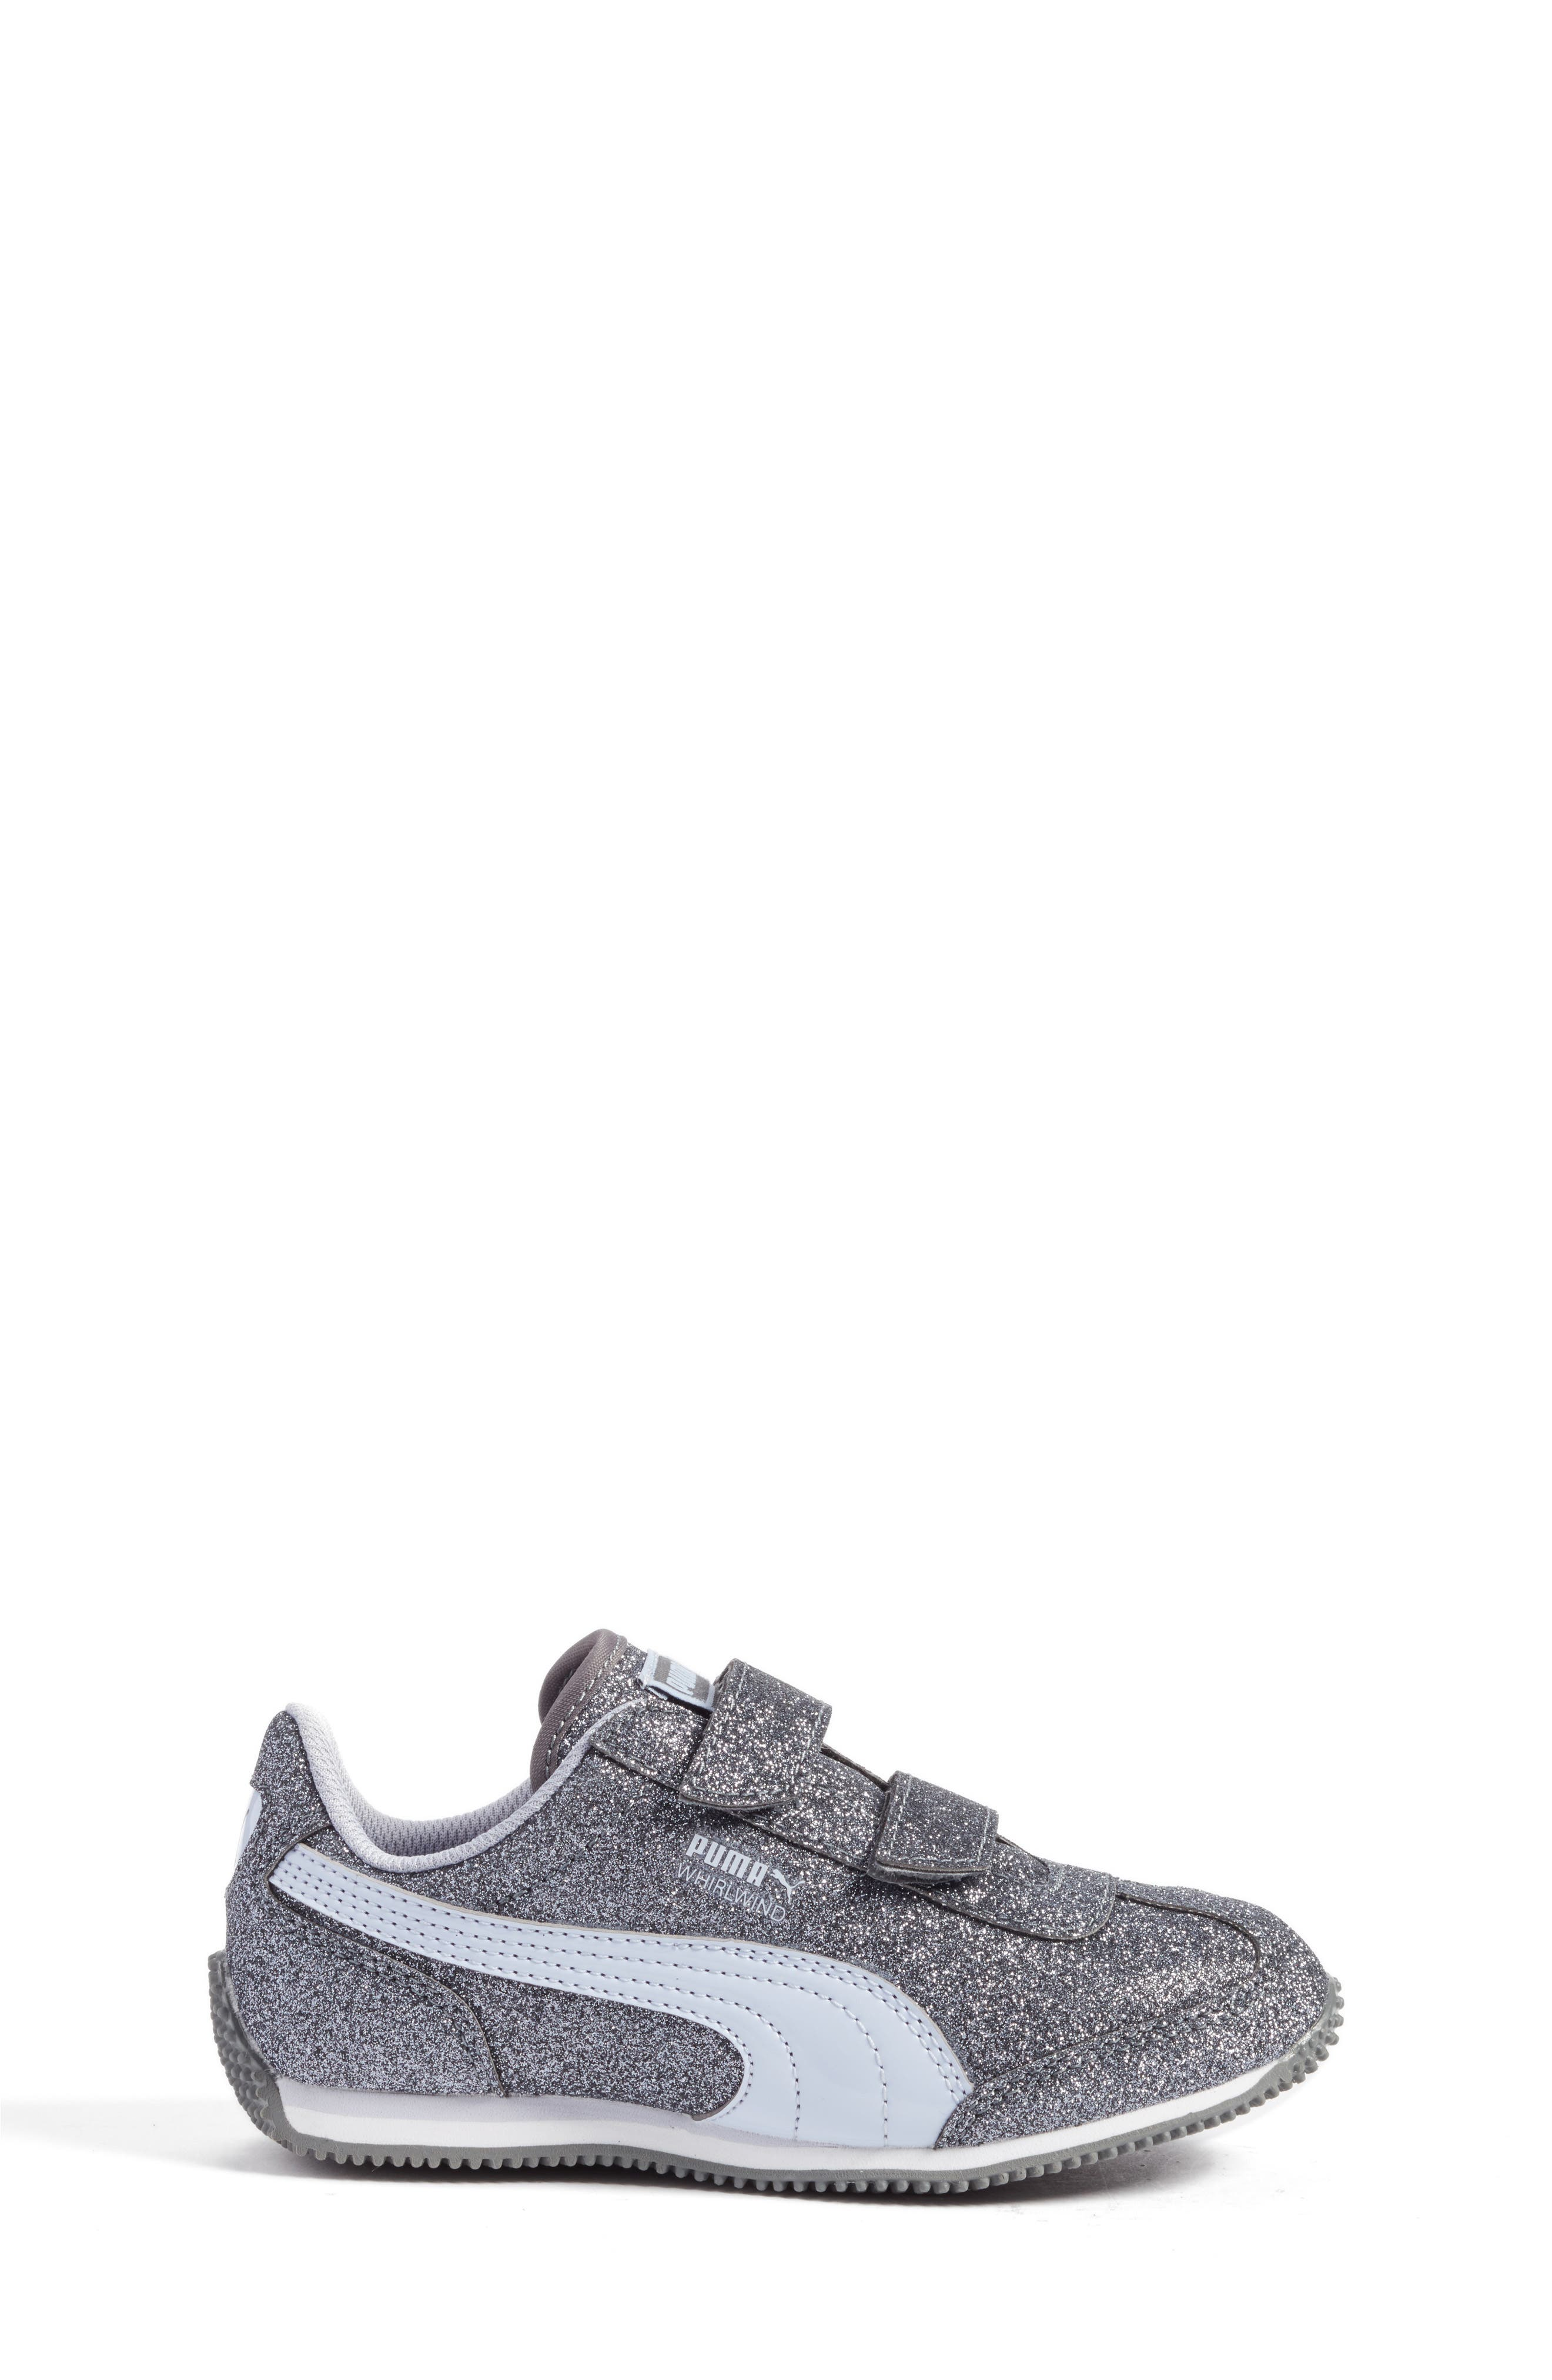 Whirlwind Glitz Sneaker,                             Alternate thumbnail 3, color,                             400